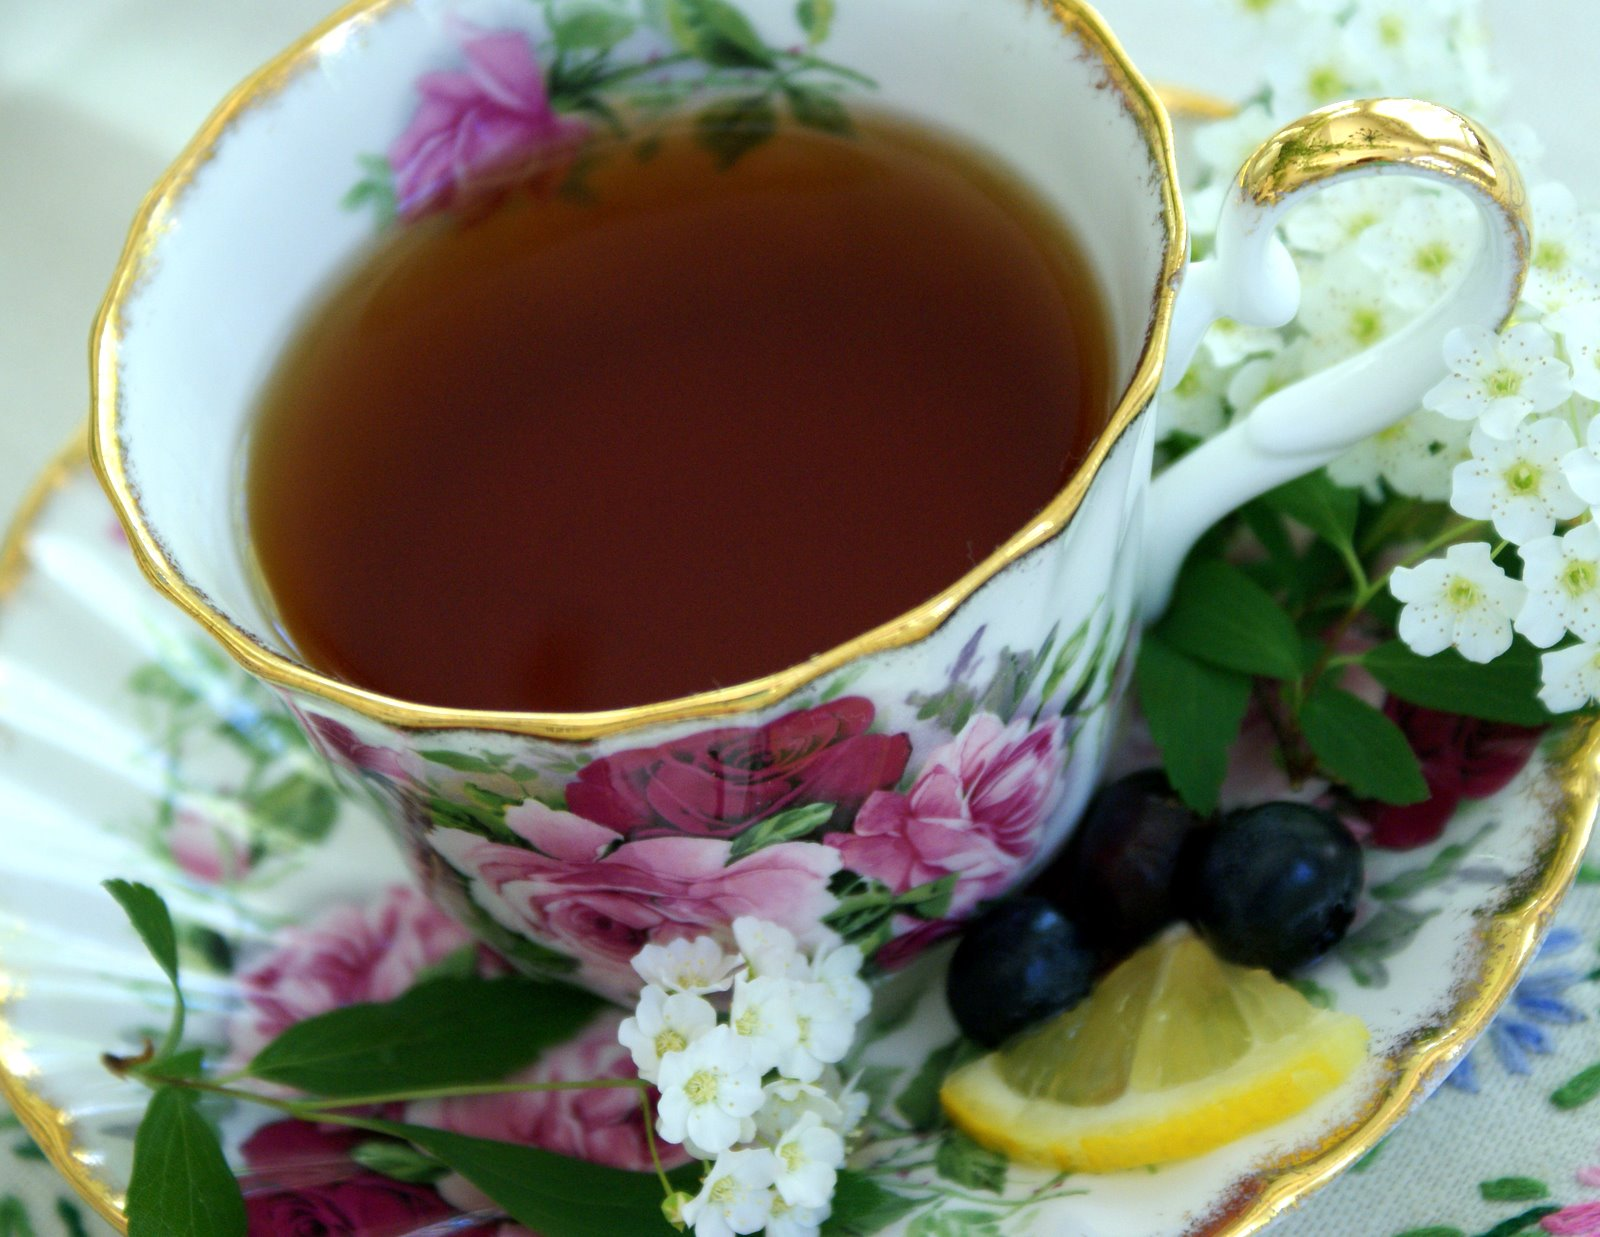 фото красивой чашки чая каждый, кто наказан